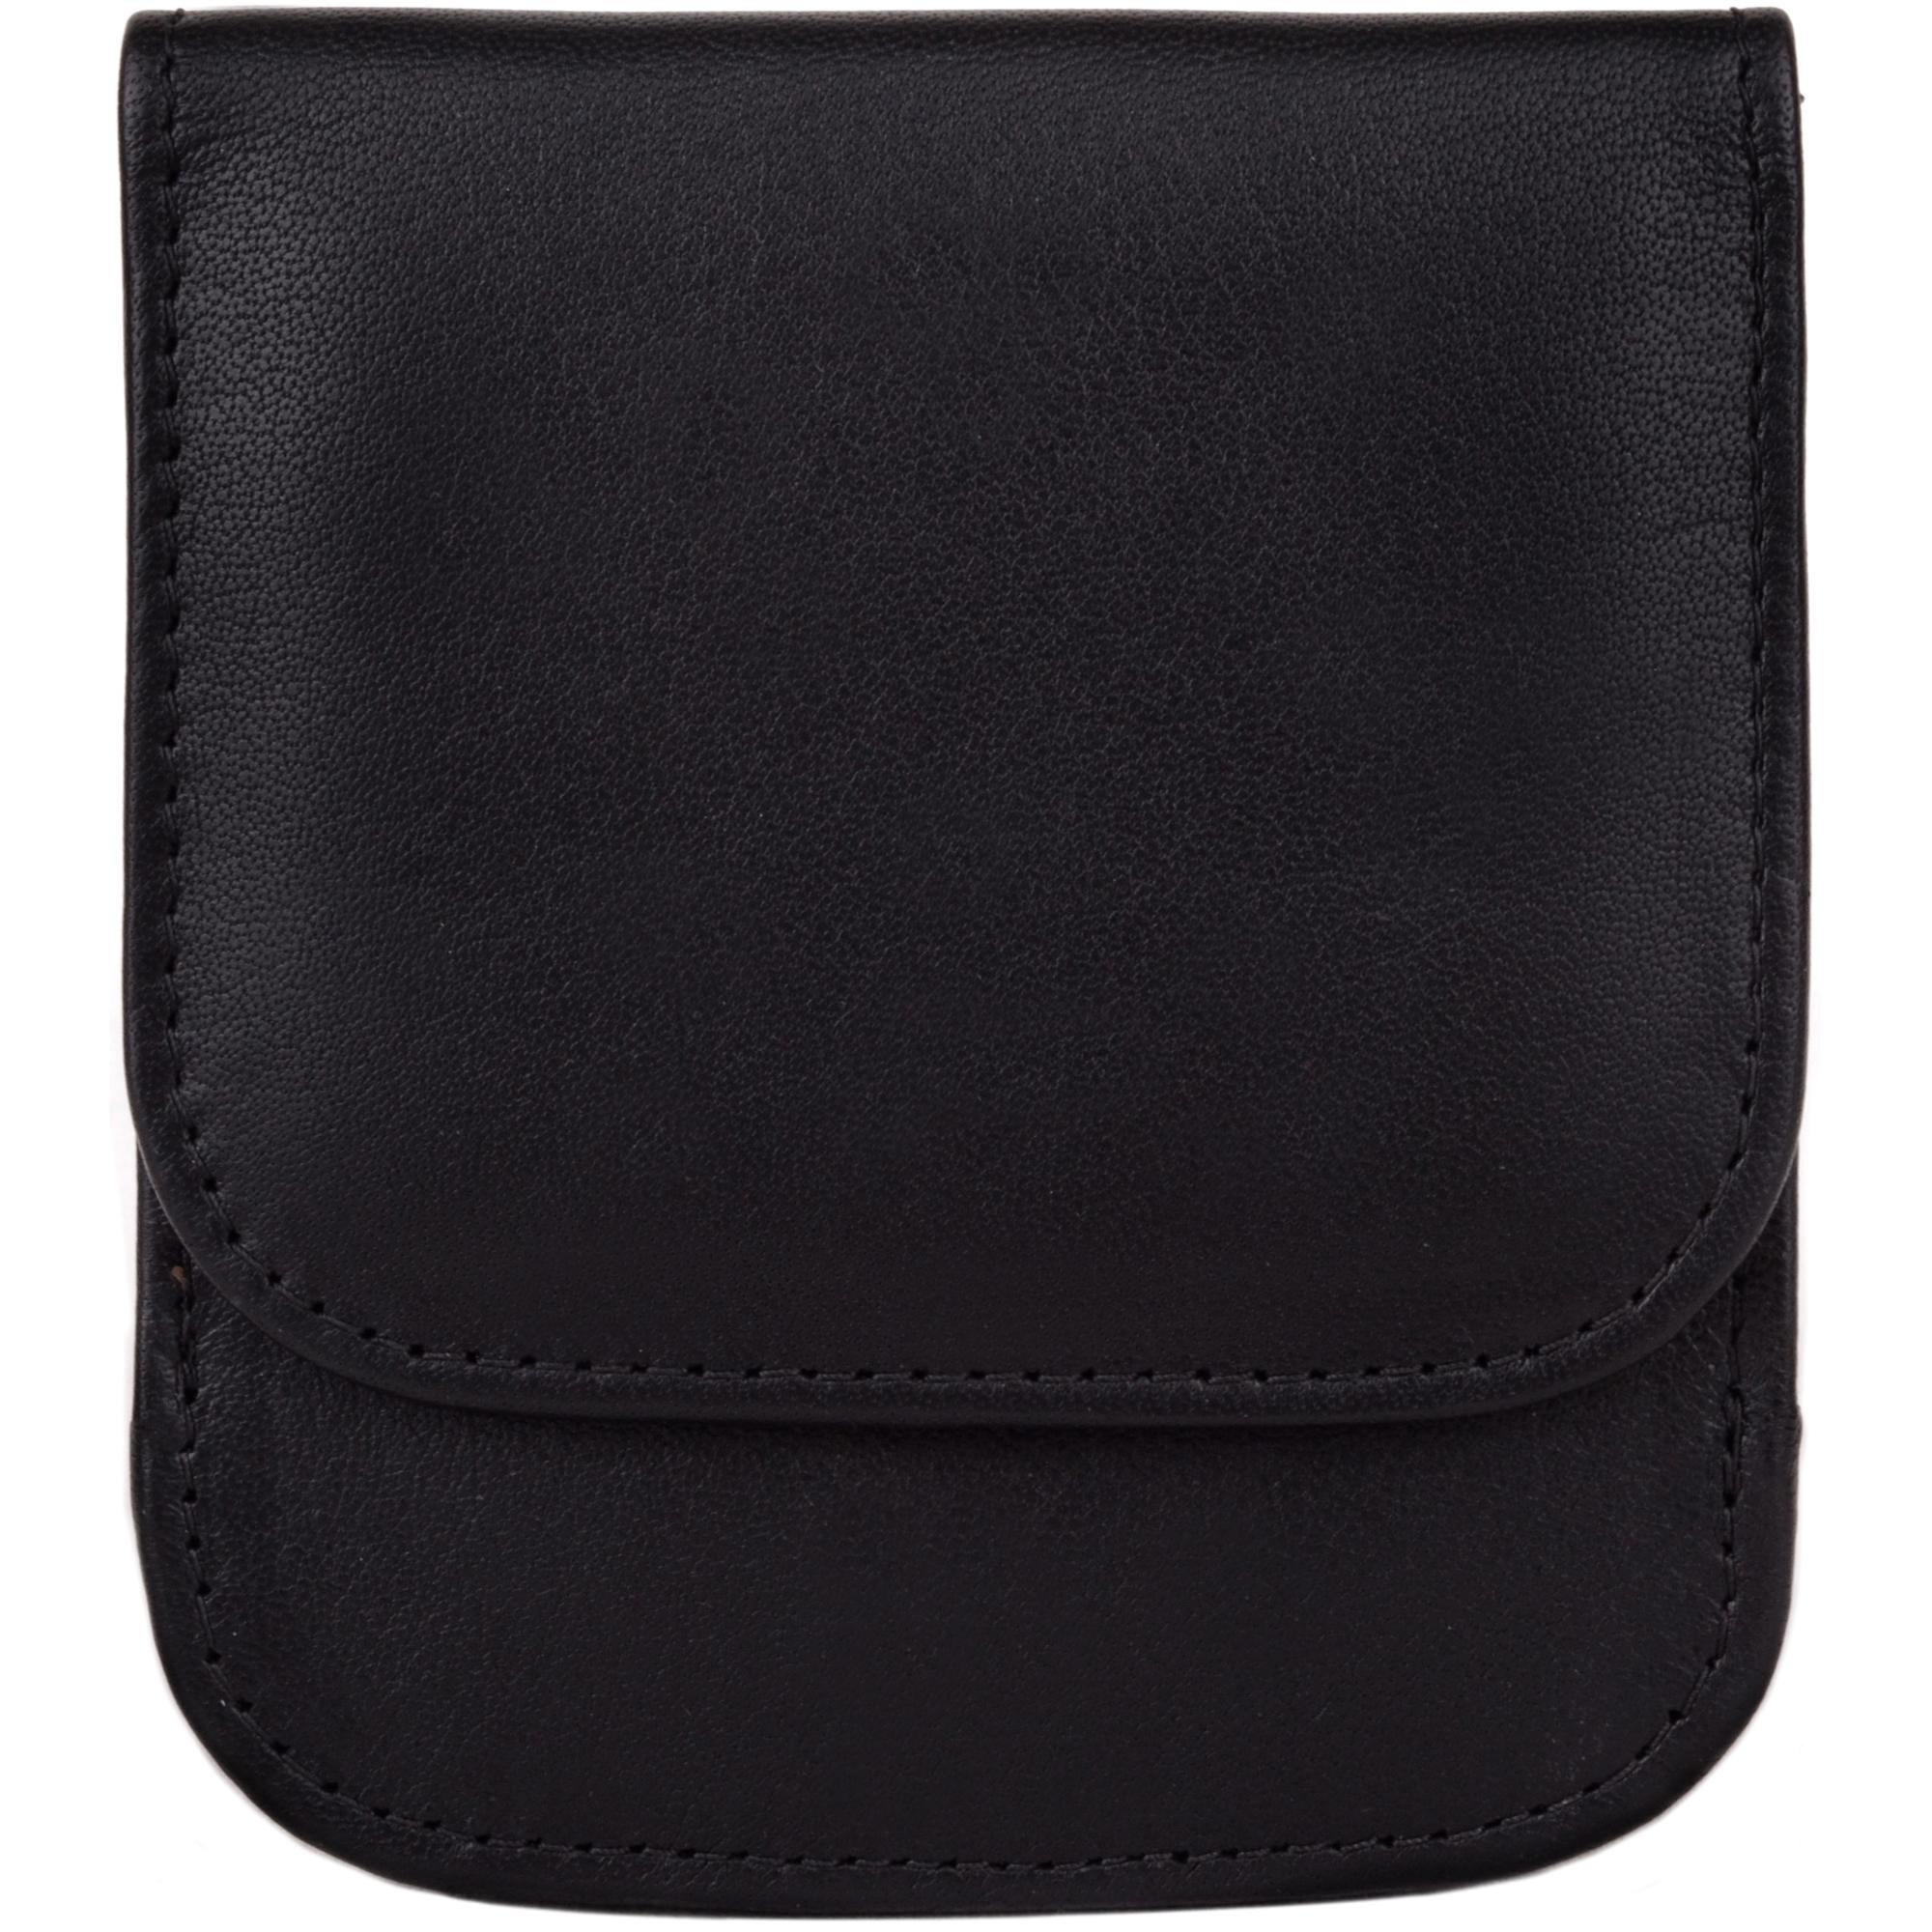 Soft Leather Coin Holder - Allie - Black